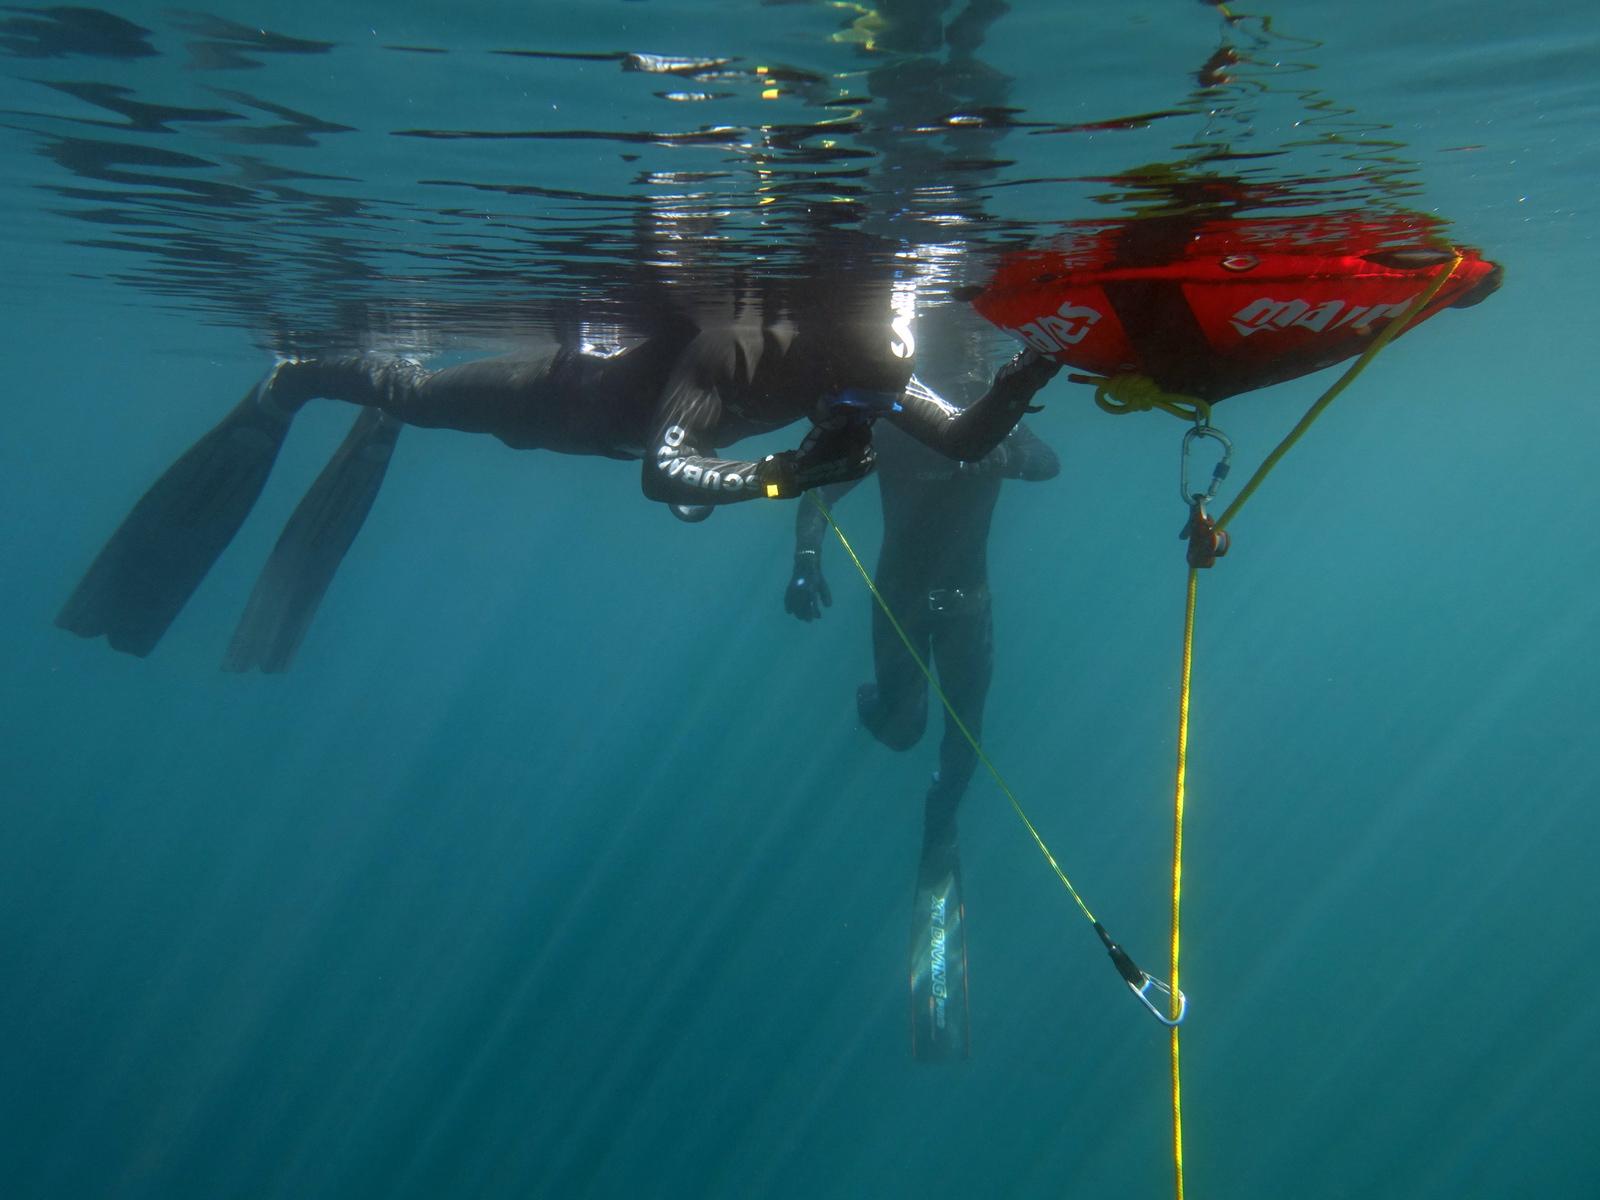 Freediver an der Apnoe Boje